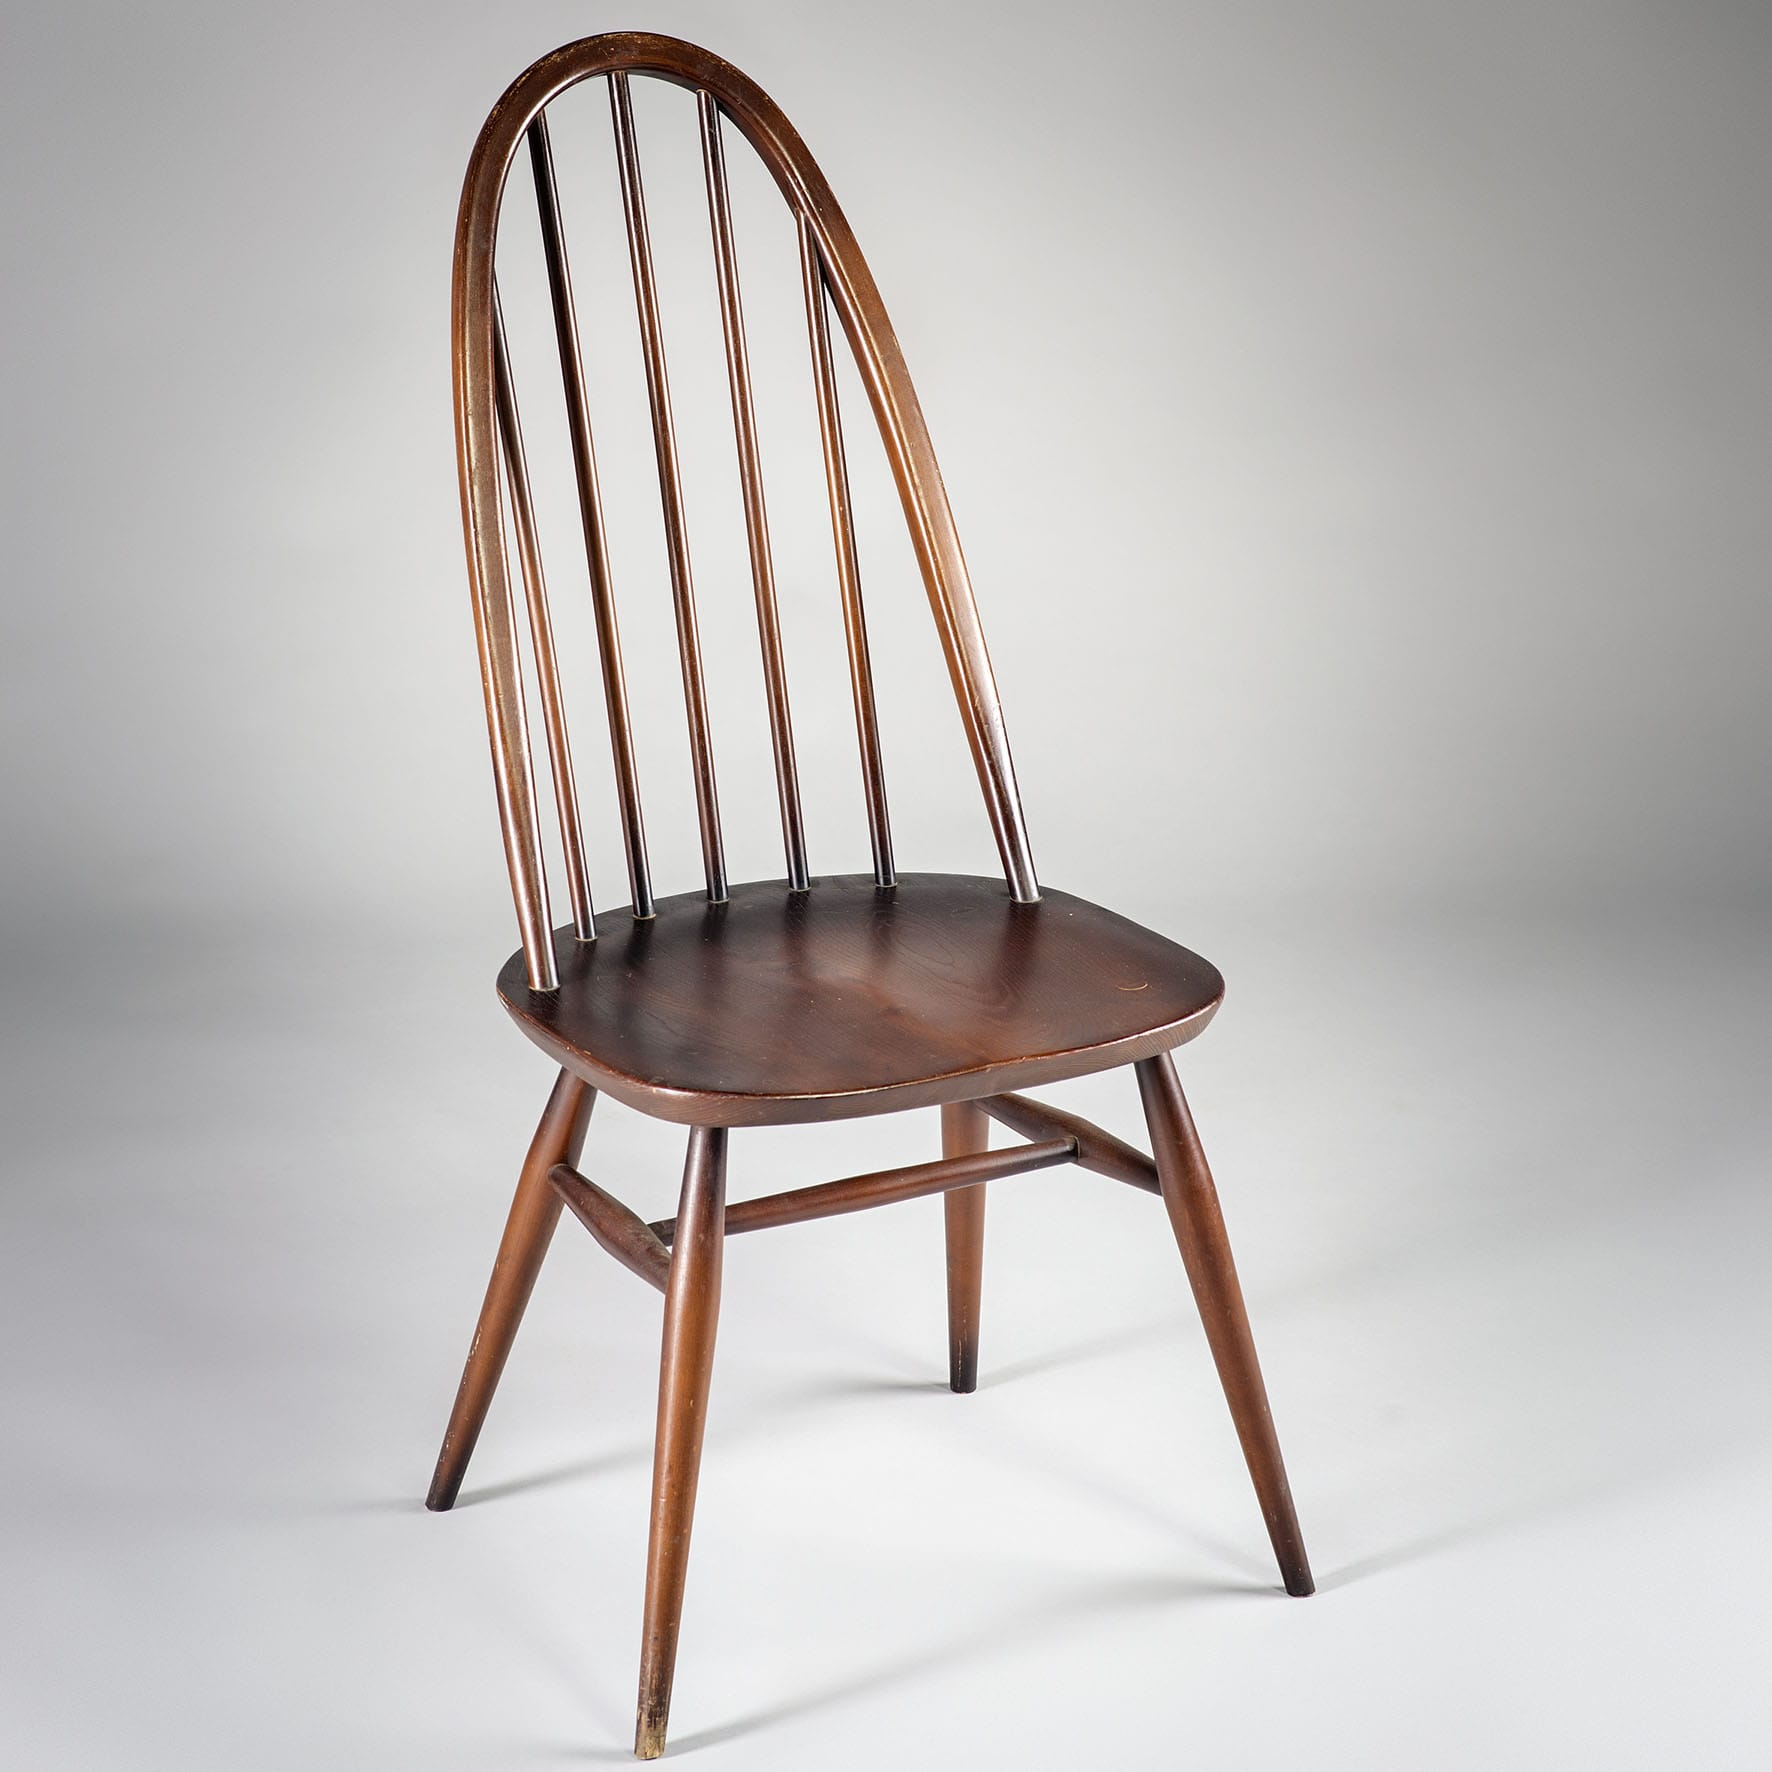 chaise anglaise ercol windsor quaker ann es 60 lignedebrocante brocante en ligne chine. Black Bedroom Furniture Sets. Home Design Ideas